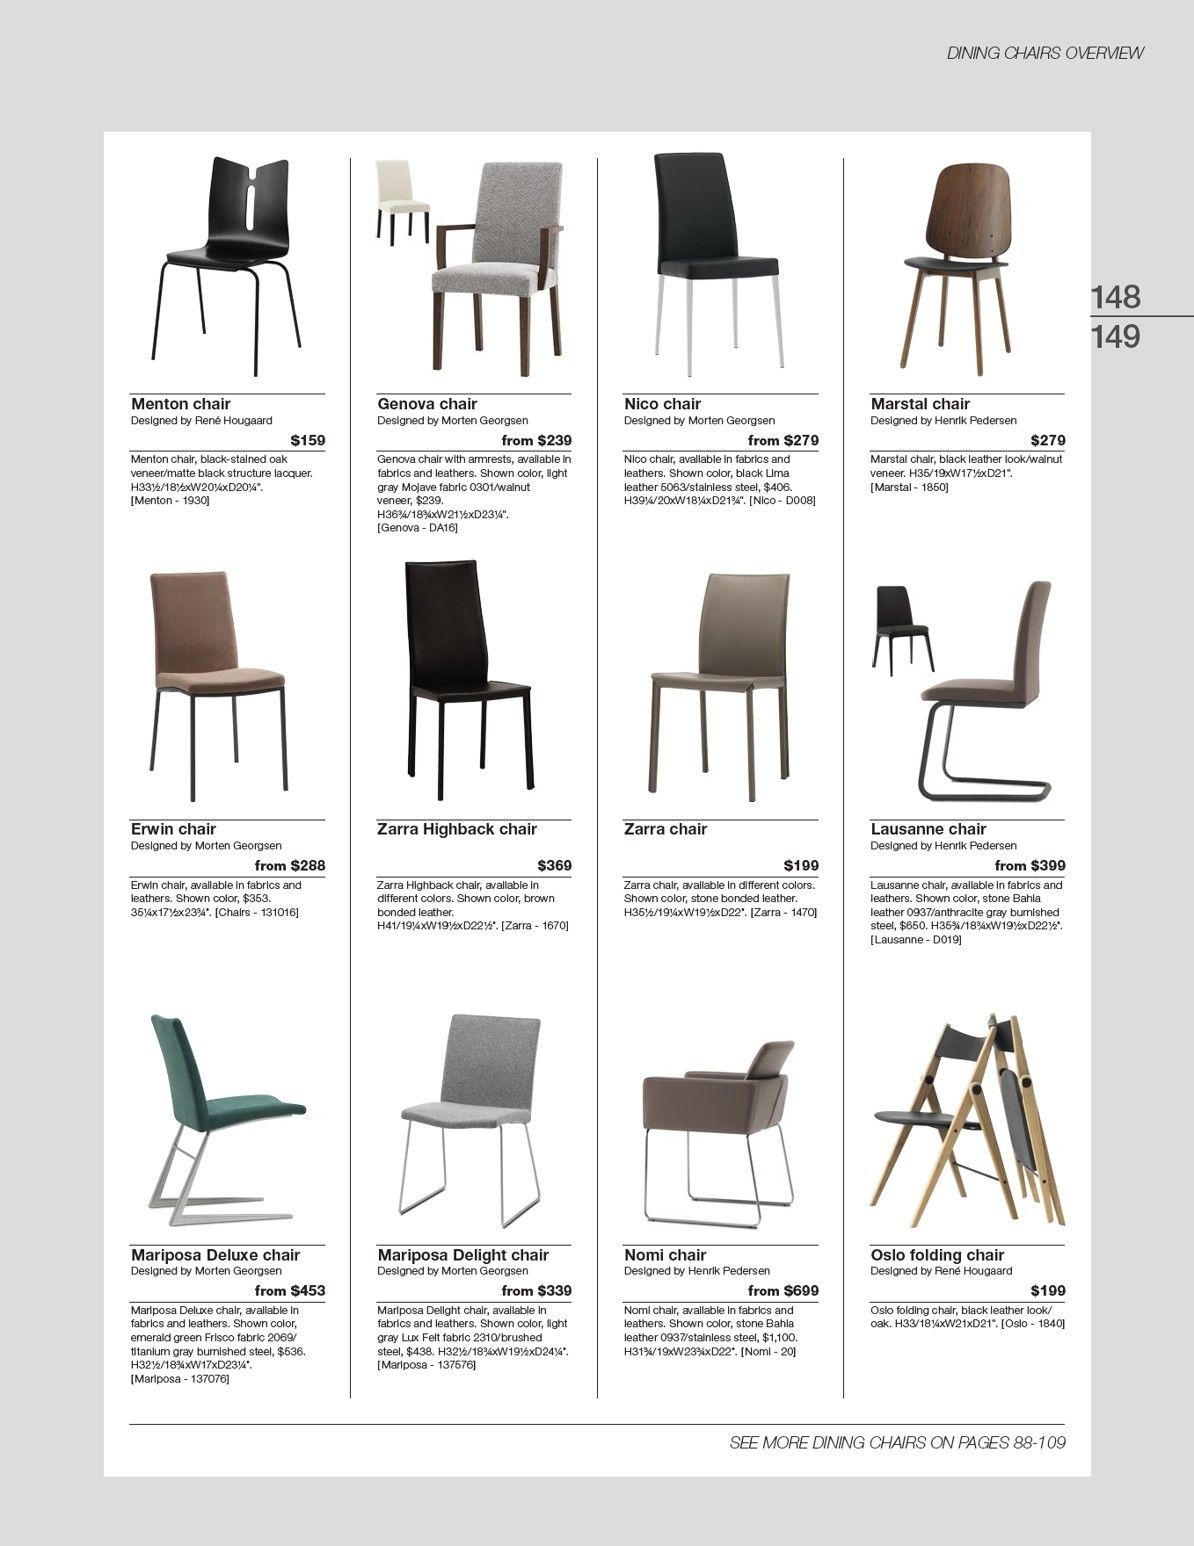 Mariposa urban Dining designFurniture Chair BoConcept GqLUMVpSz